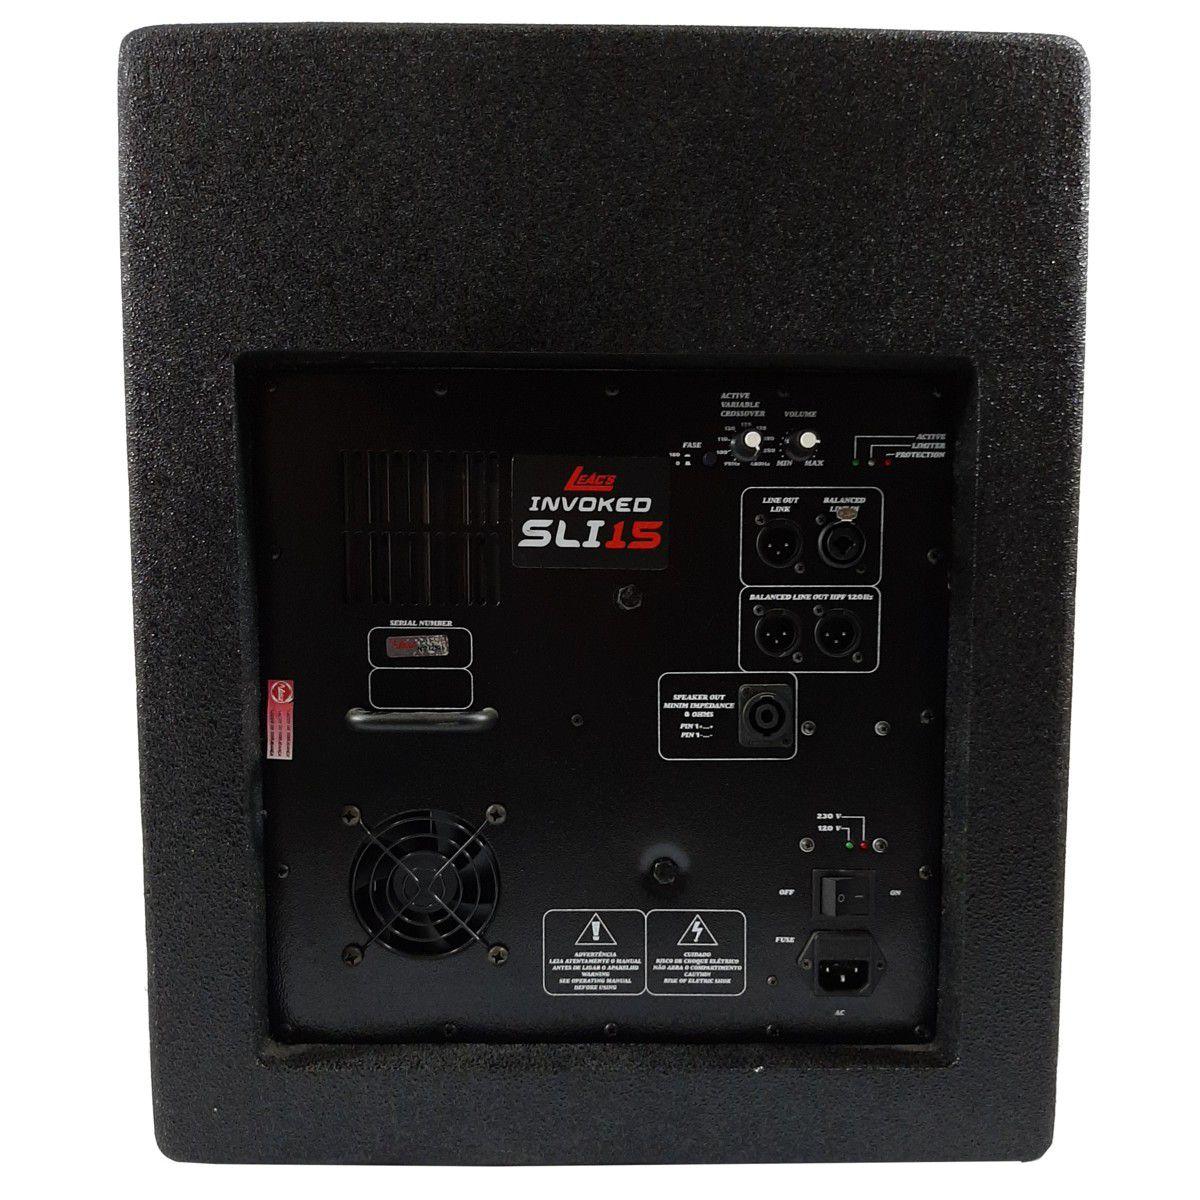 Sistema Pa Sub Woofer Leacs Sli1500 + Frontal e Retorno Brava 1200